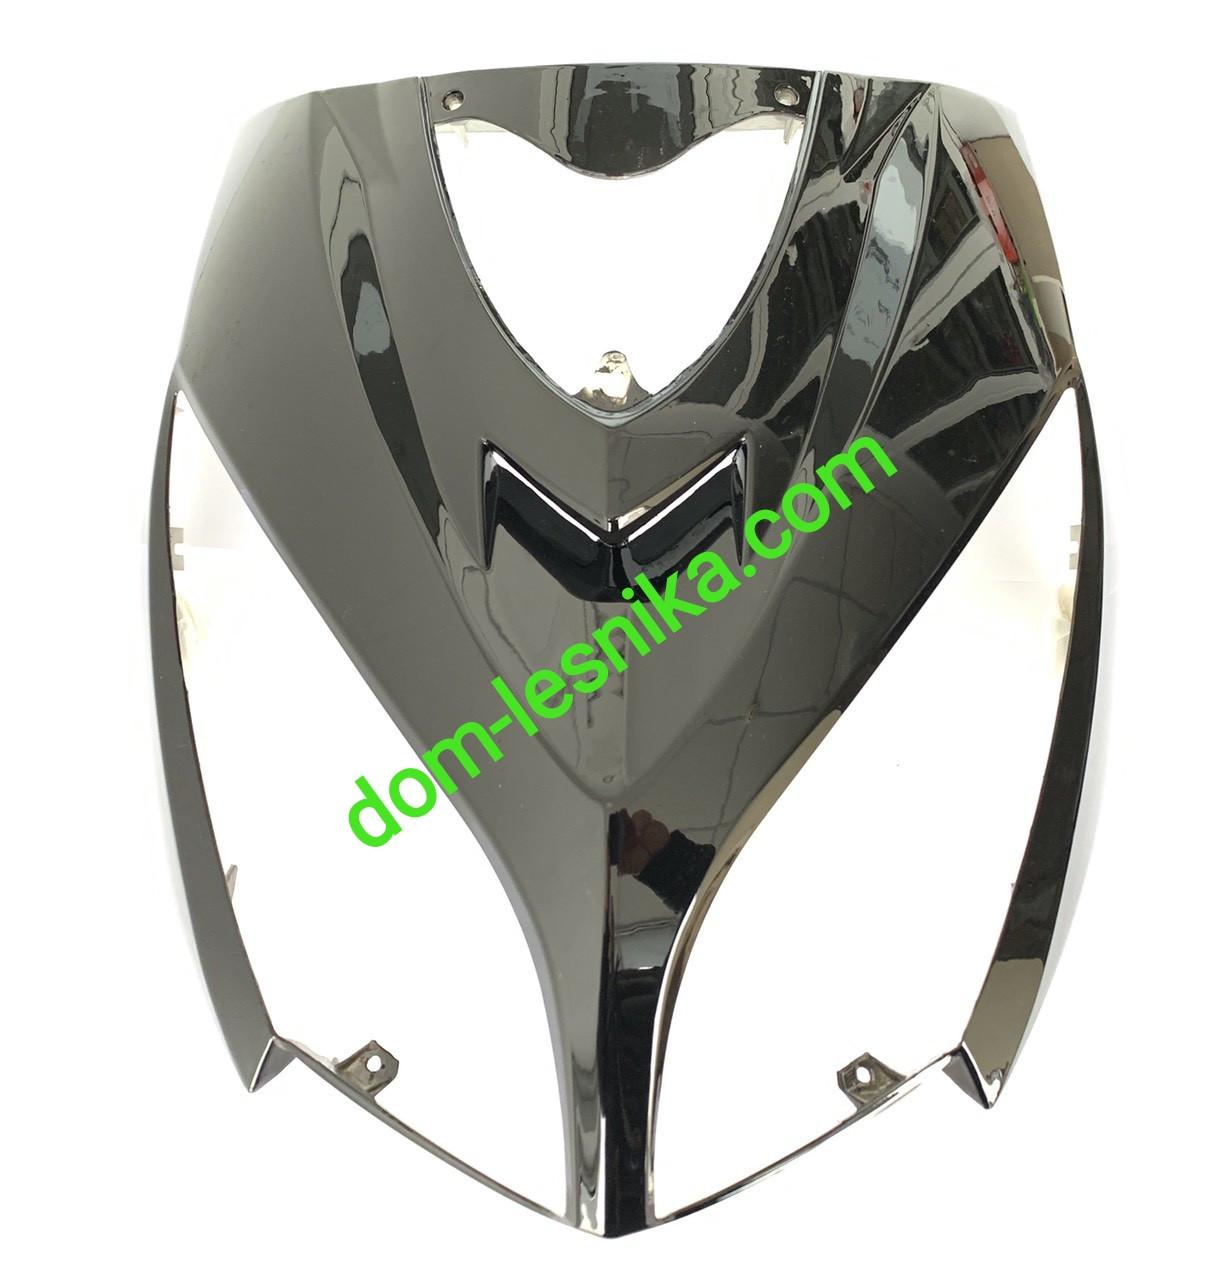 Пластик клюв для скутера Viper Storm,модель NEW